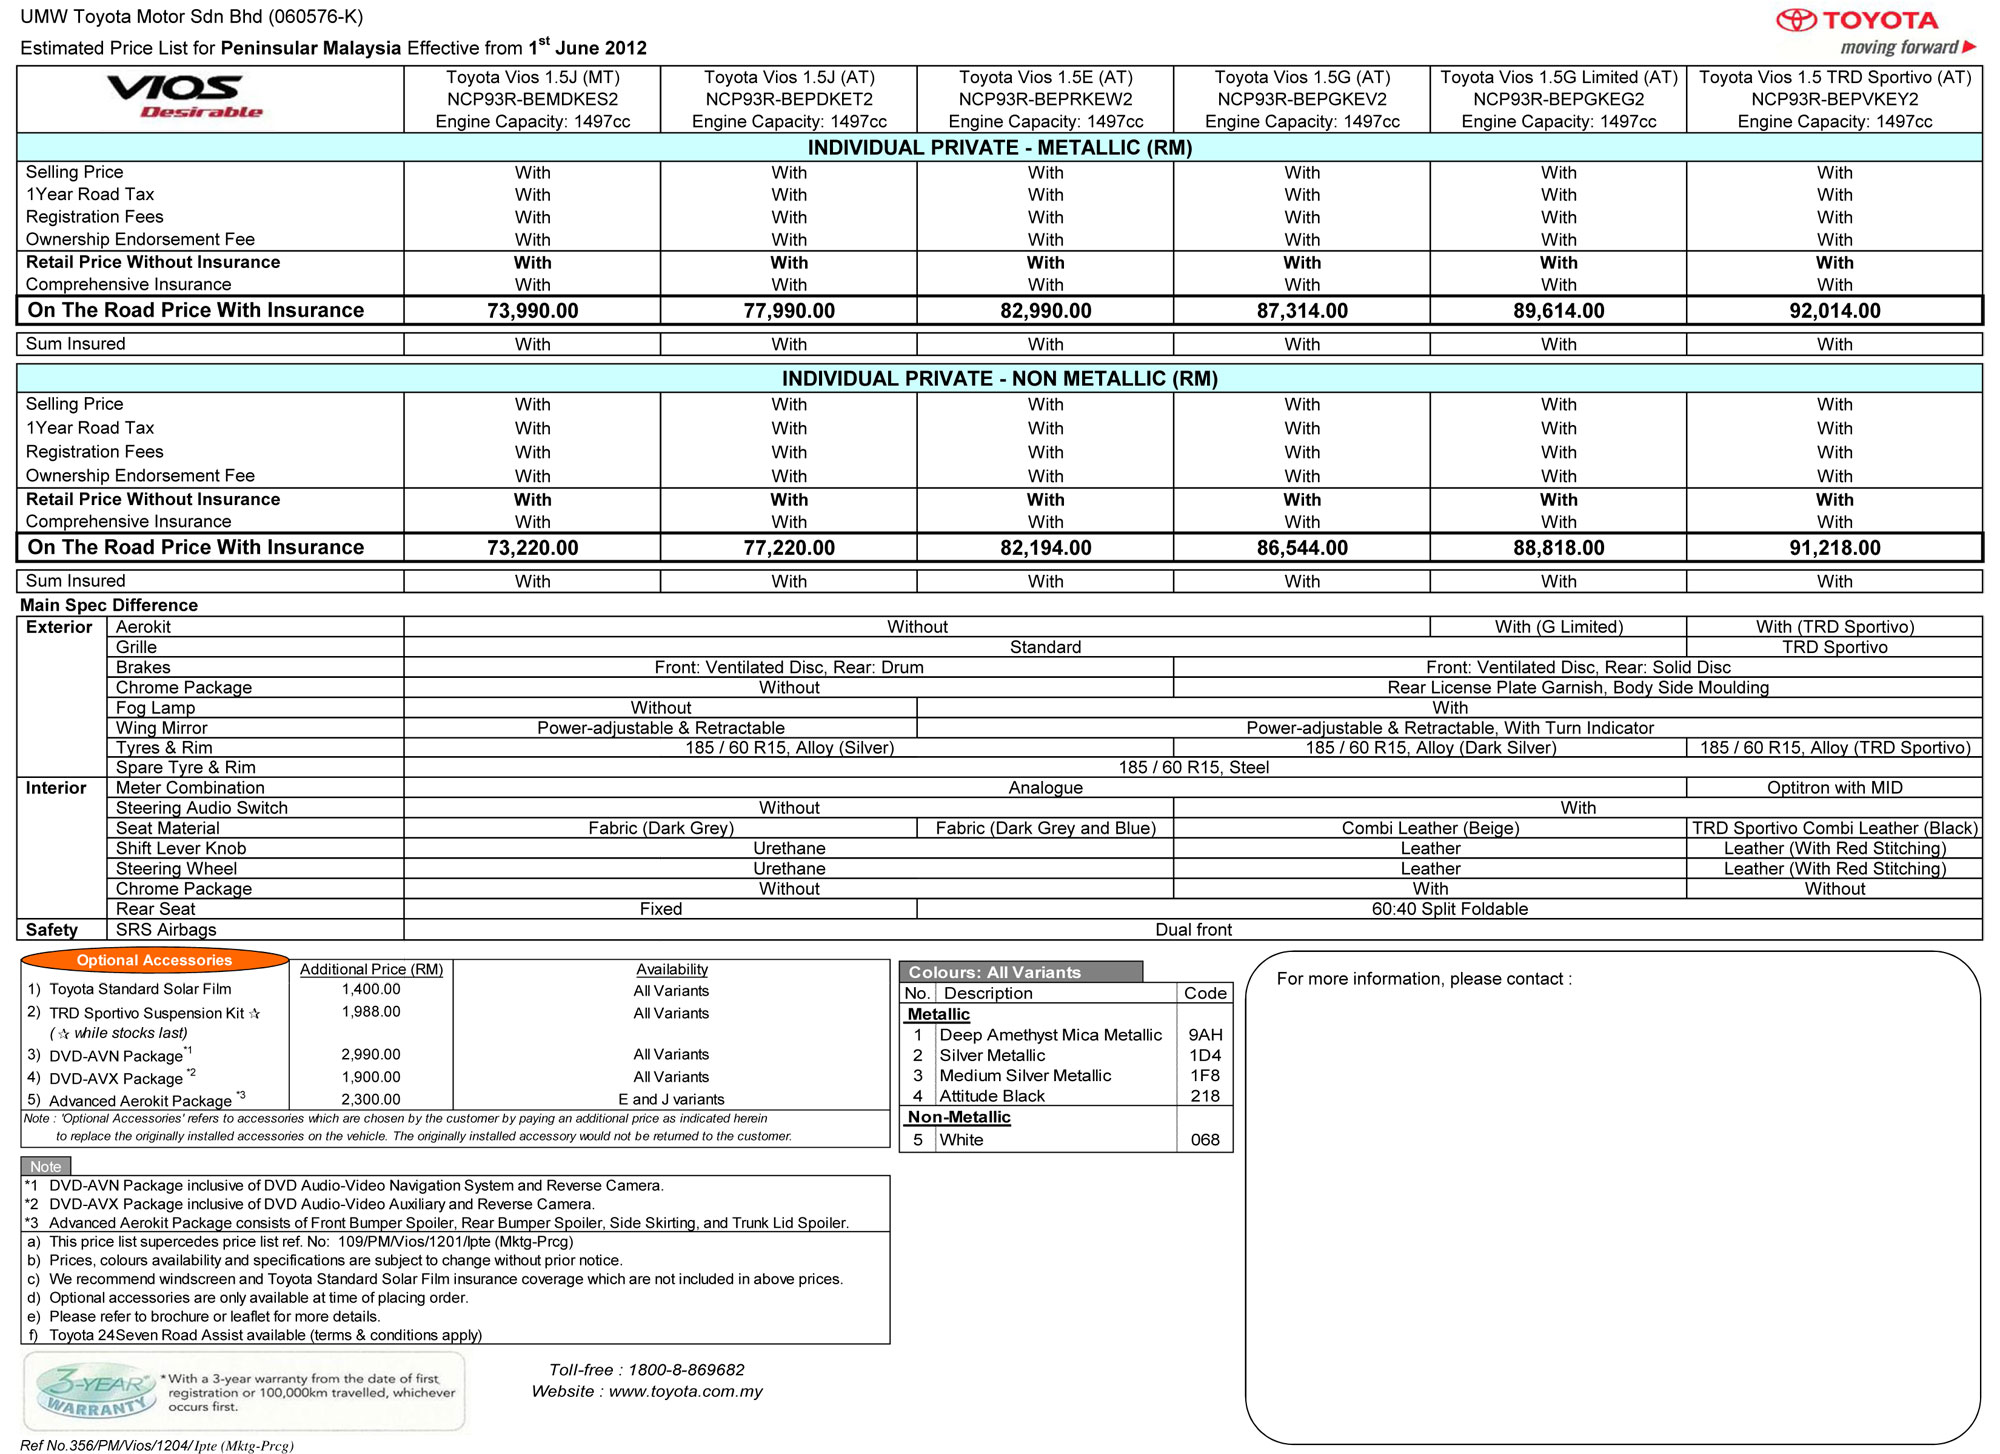 Toyota Vios Enhanced For 2012 Rm73k To Rm92k Image 113867